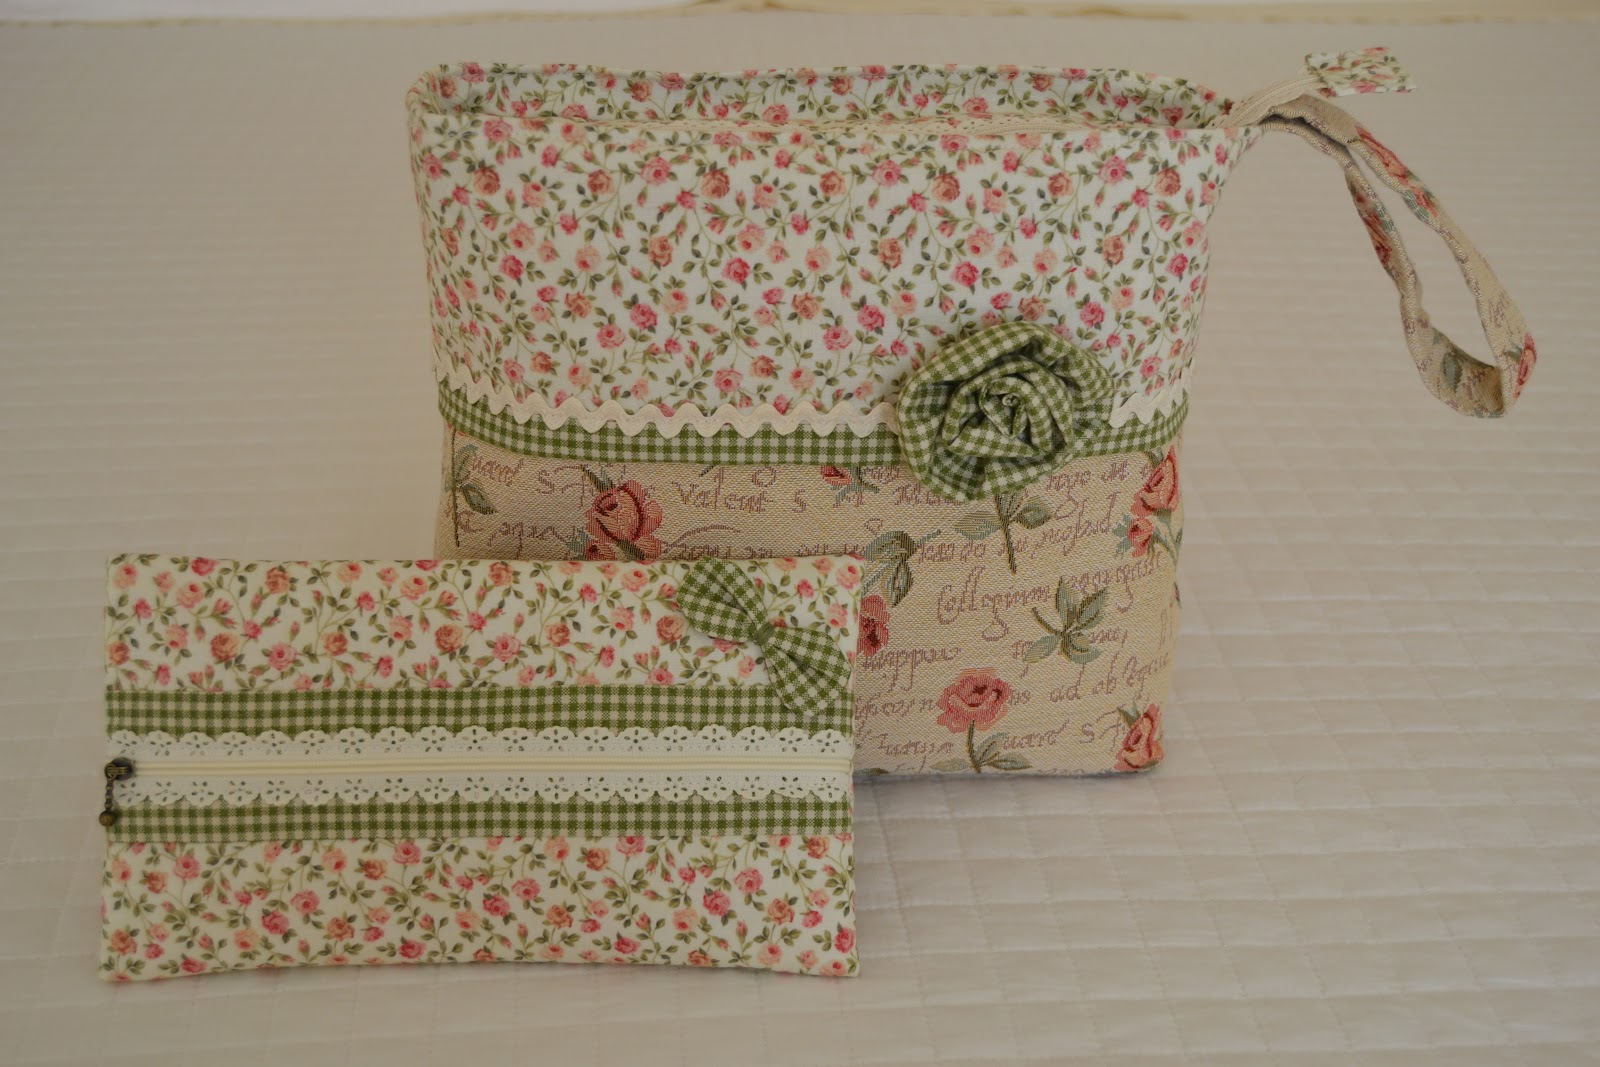 couture deco on pinterest tour de lit tuto sac and liberty. Black Bedroom Furniture Sets. Home Design Ideas